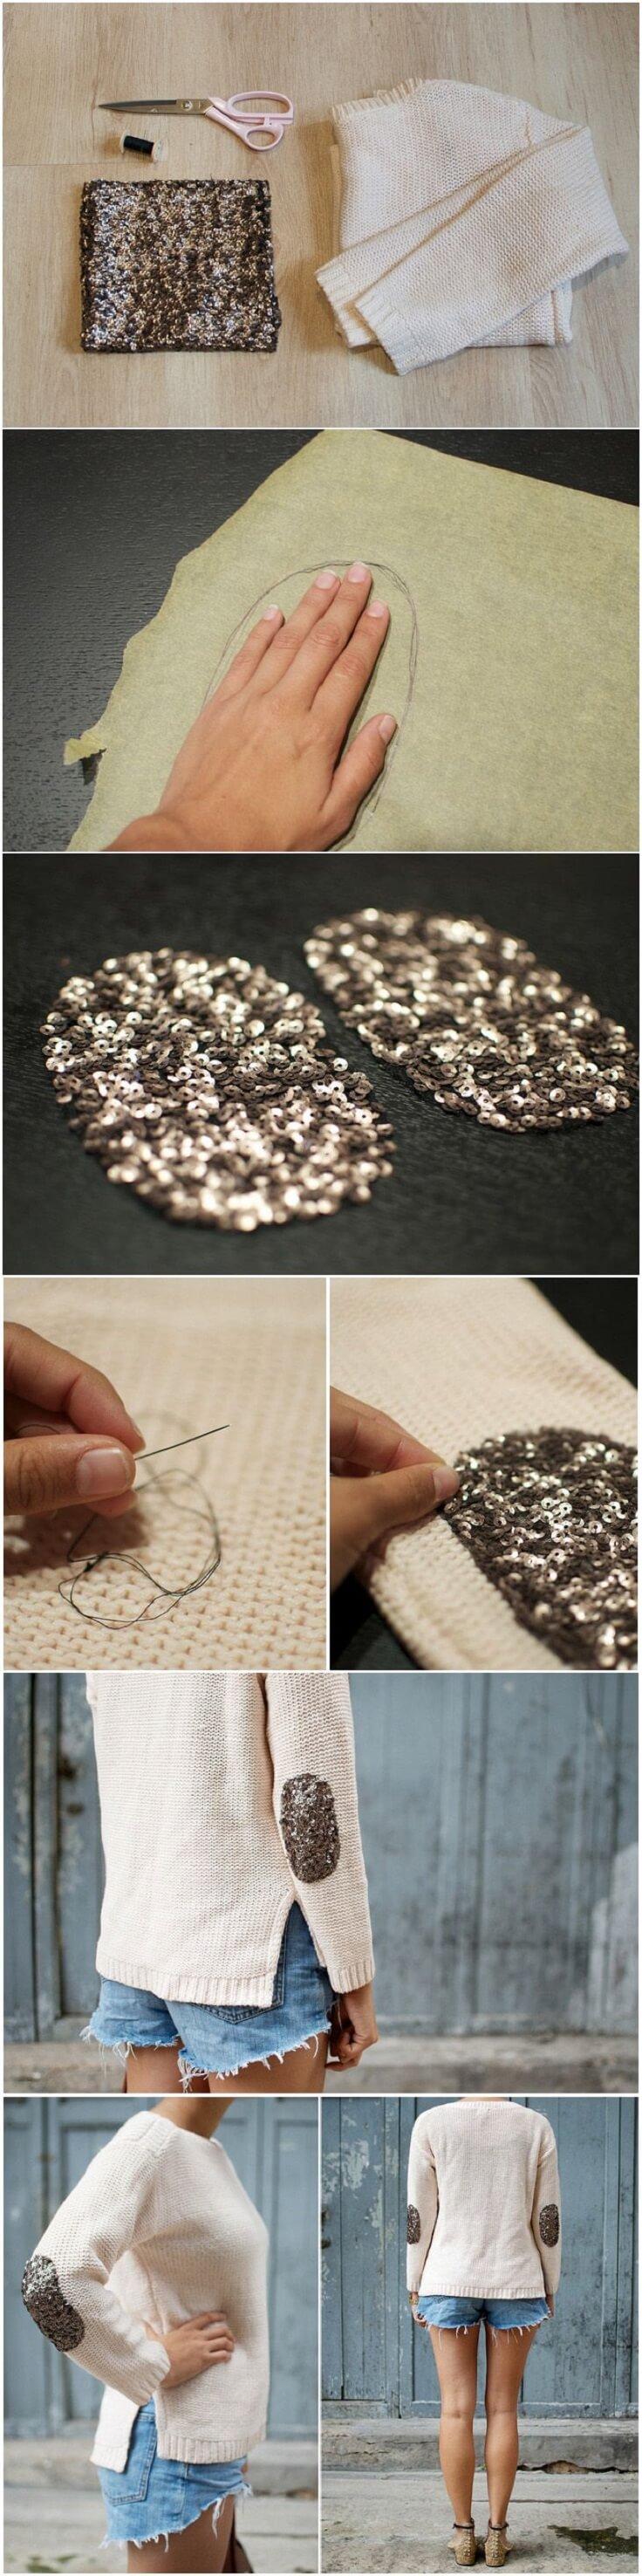 DIY-Glitter-Elbow-Patch-Sweater-k4craft